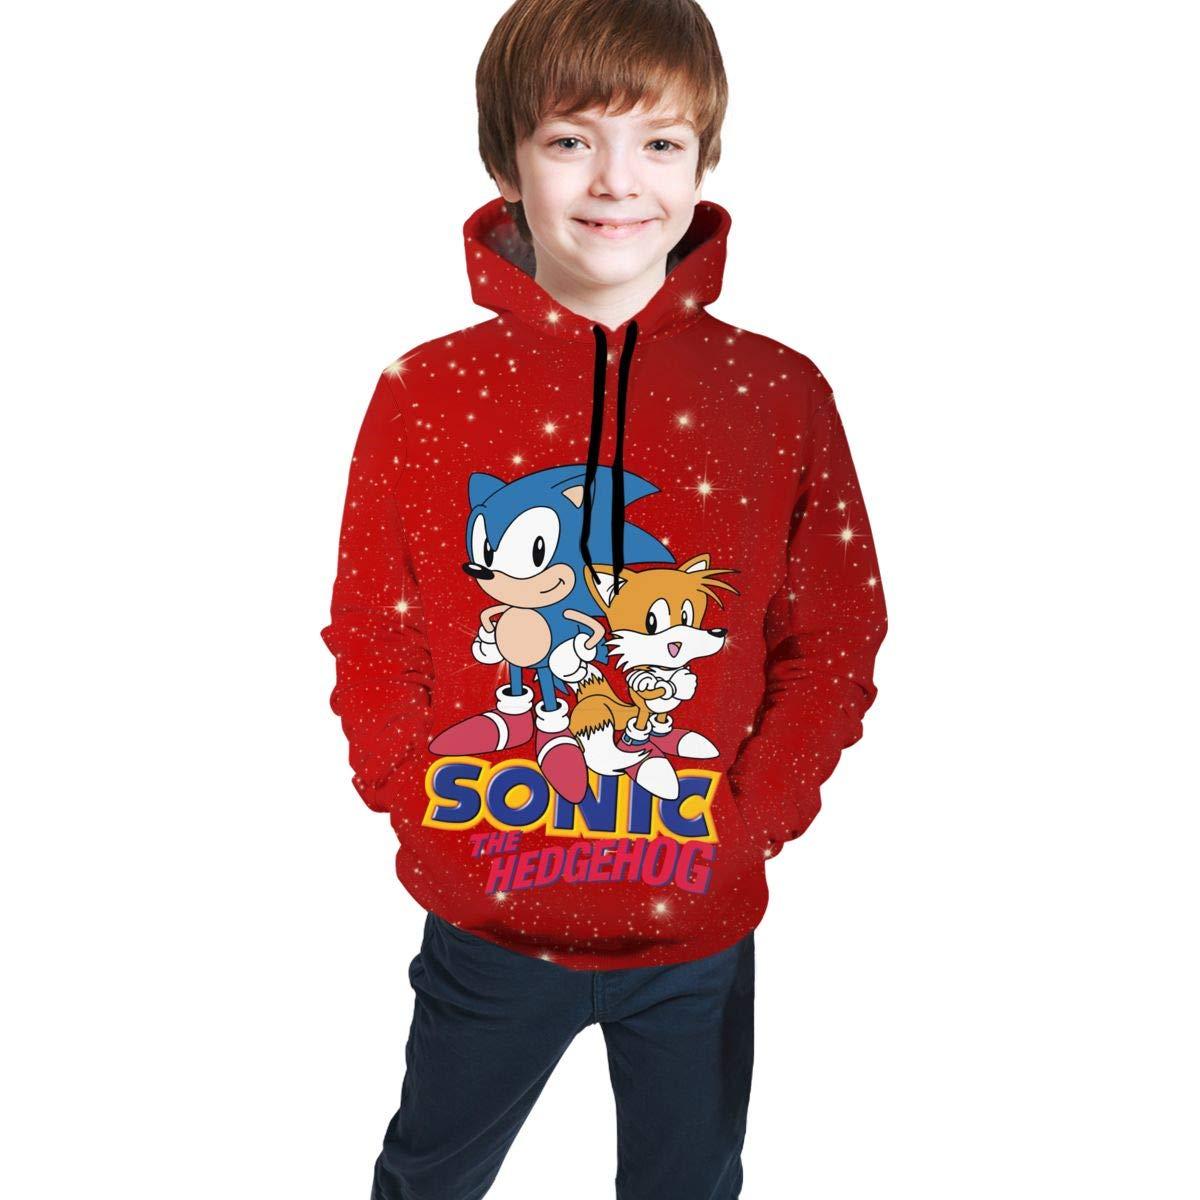 LThgn Sonic The Hedgehog Sweatshirts Pullover Hoodies for Teen Girls Boys Funny Cool Streetwear